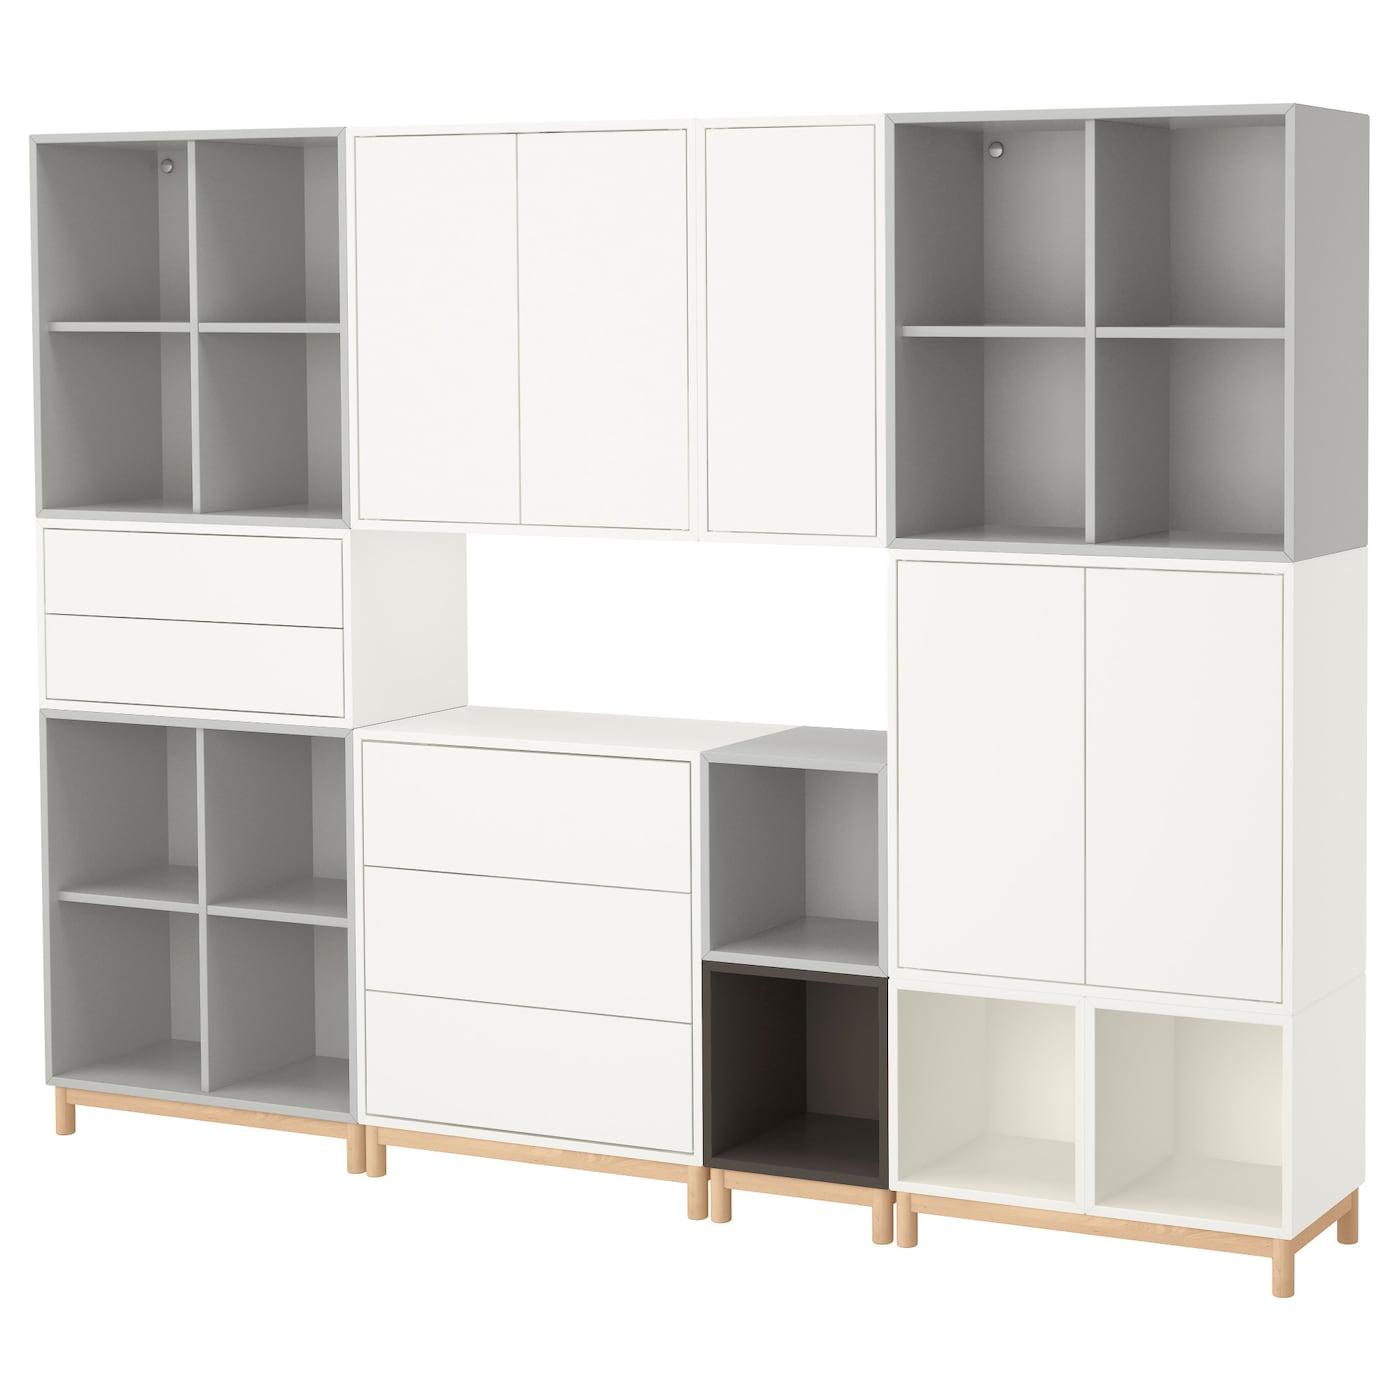 eket cabinet combination with legs white light grey dark. Black Bedroom Furniture Sets. Home Design Ideas